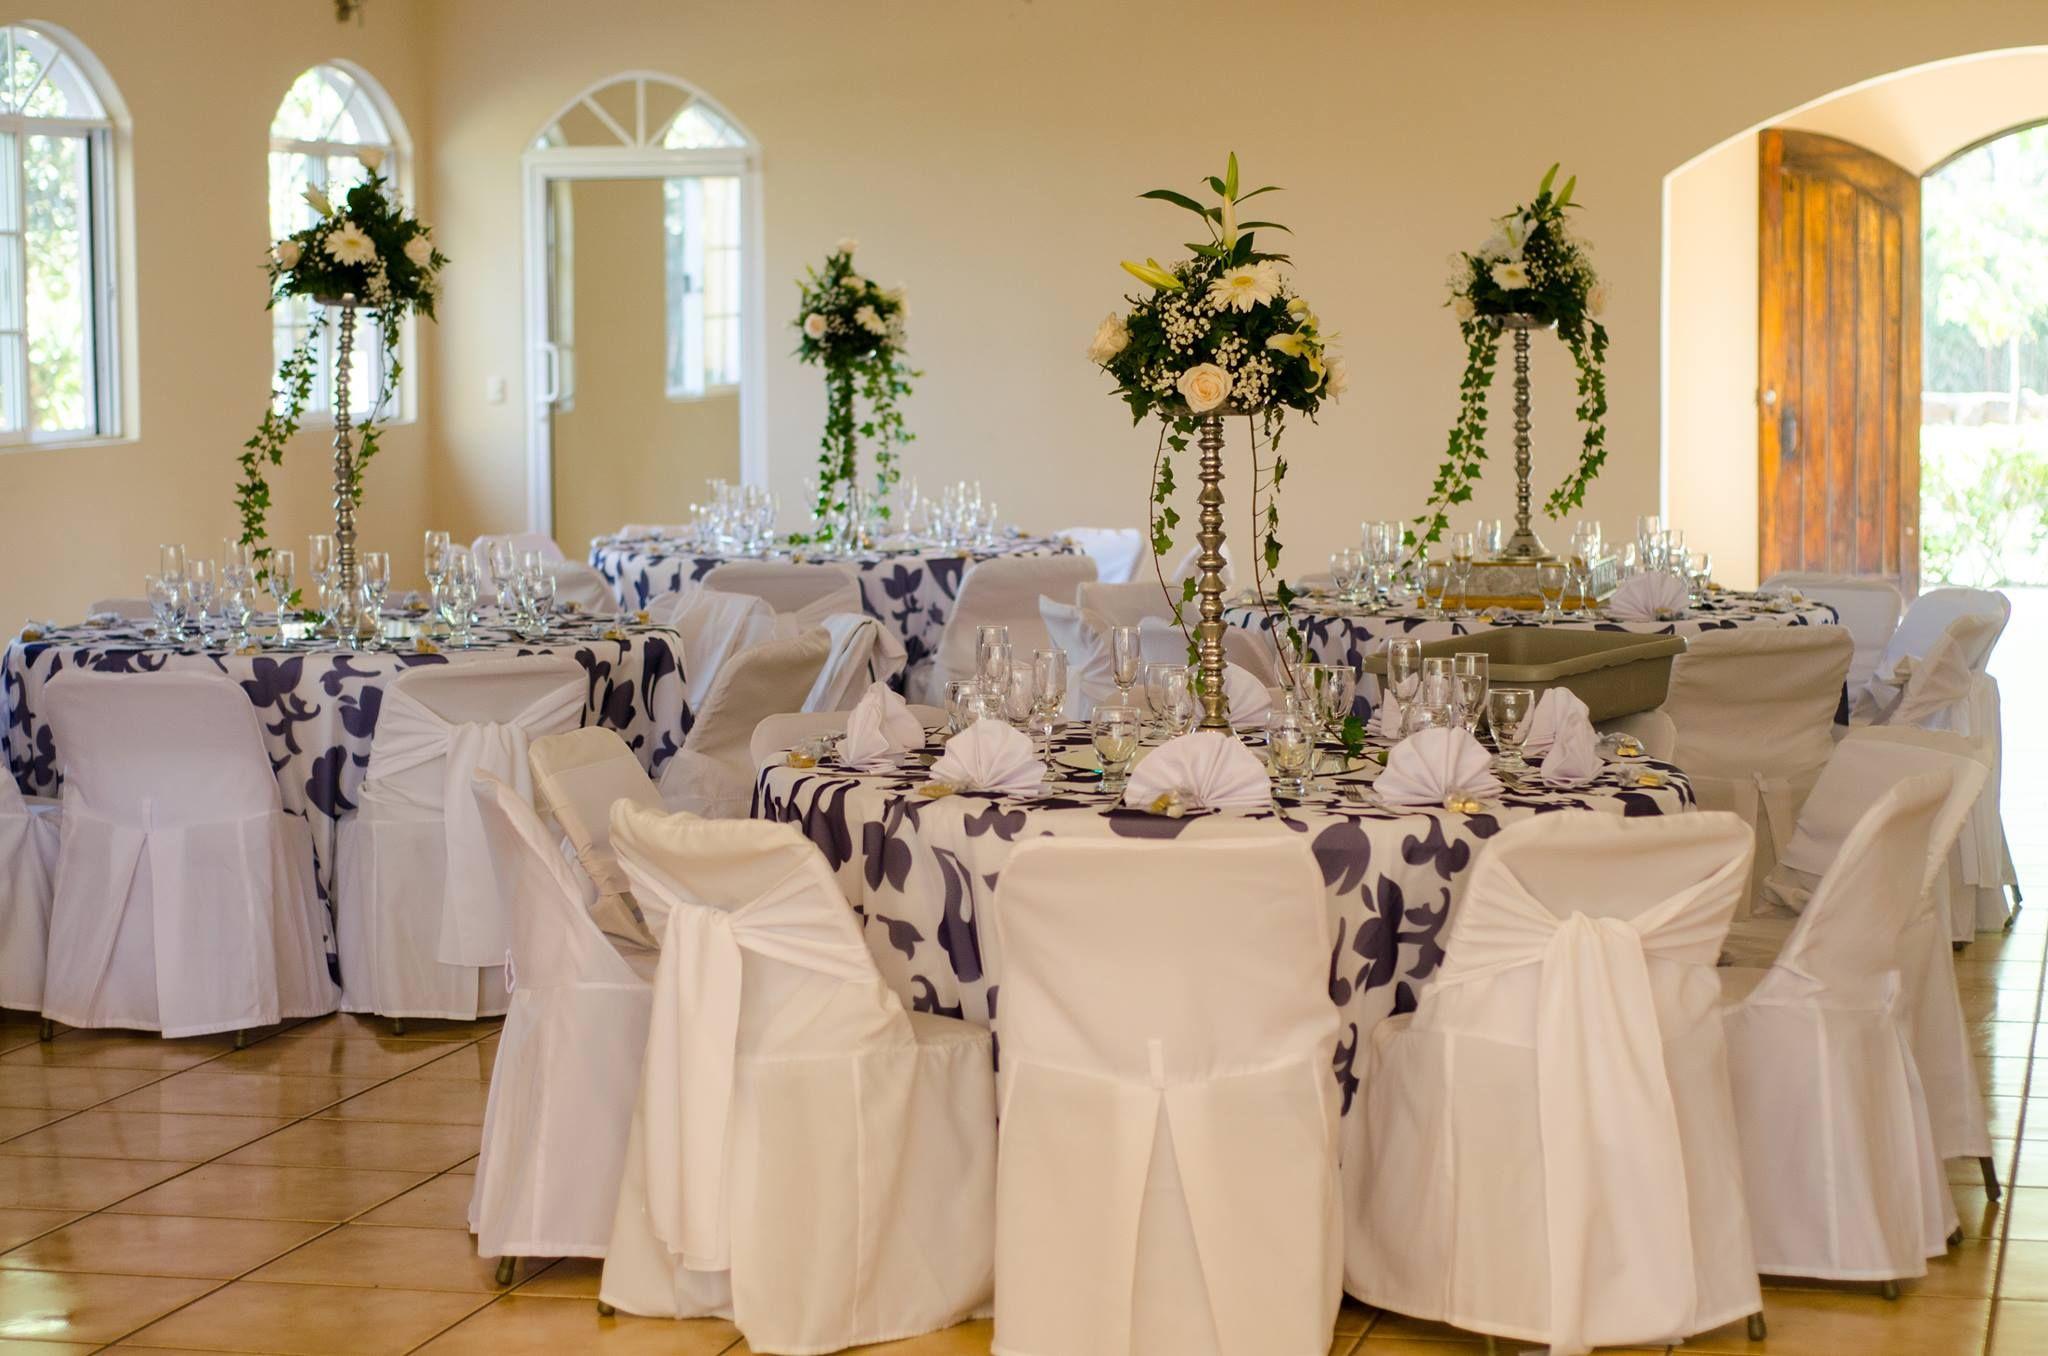 Elegante centro de mesas para bodas, Llámanos al 2211-8532